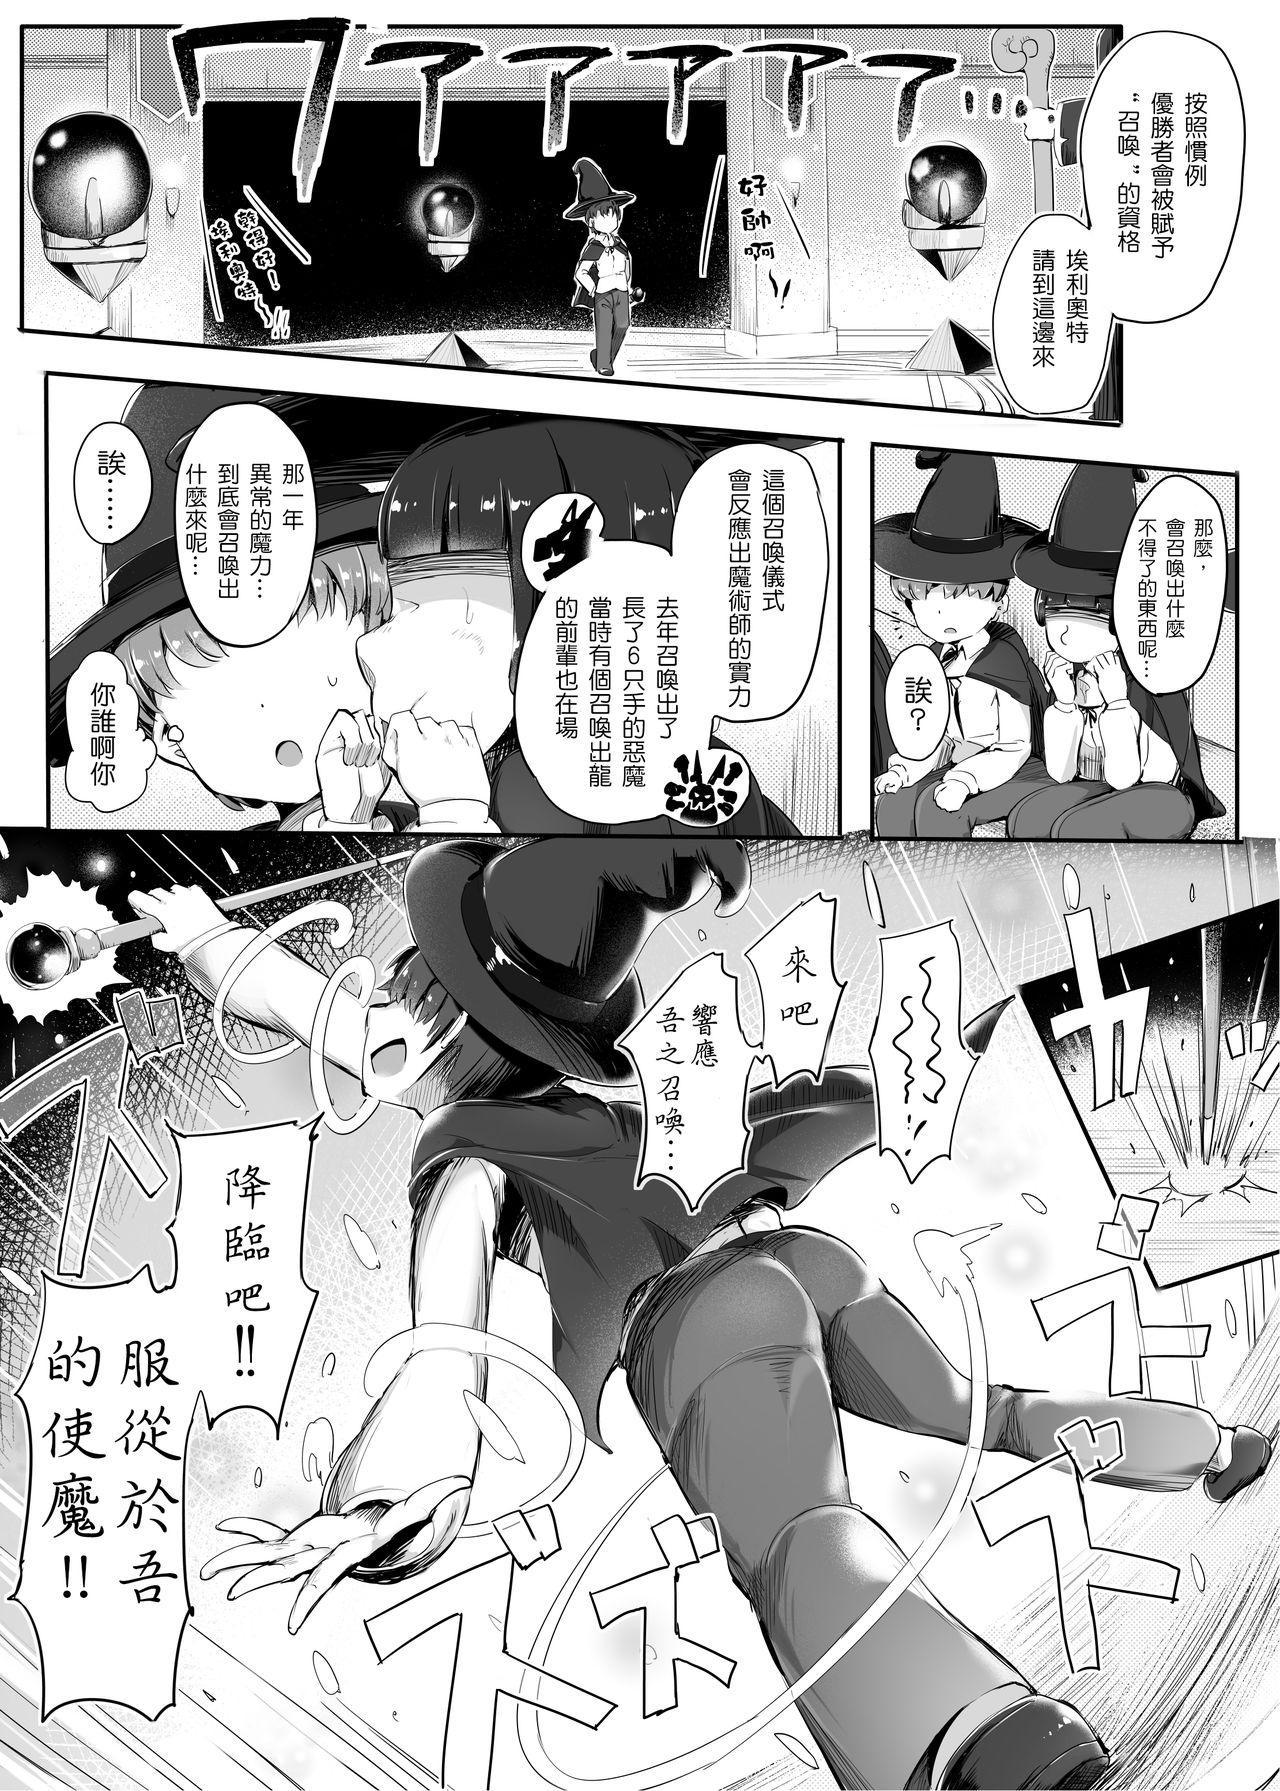 Ponkotsu Golem no Kuse ni Namaiki da. 4